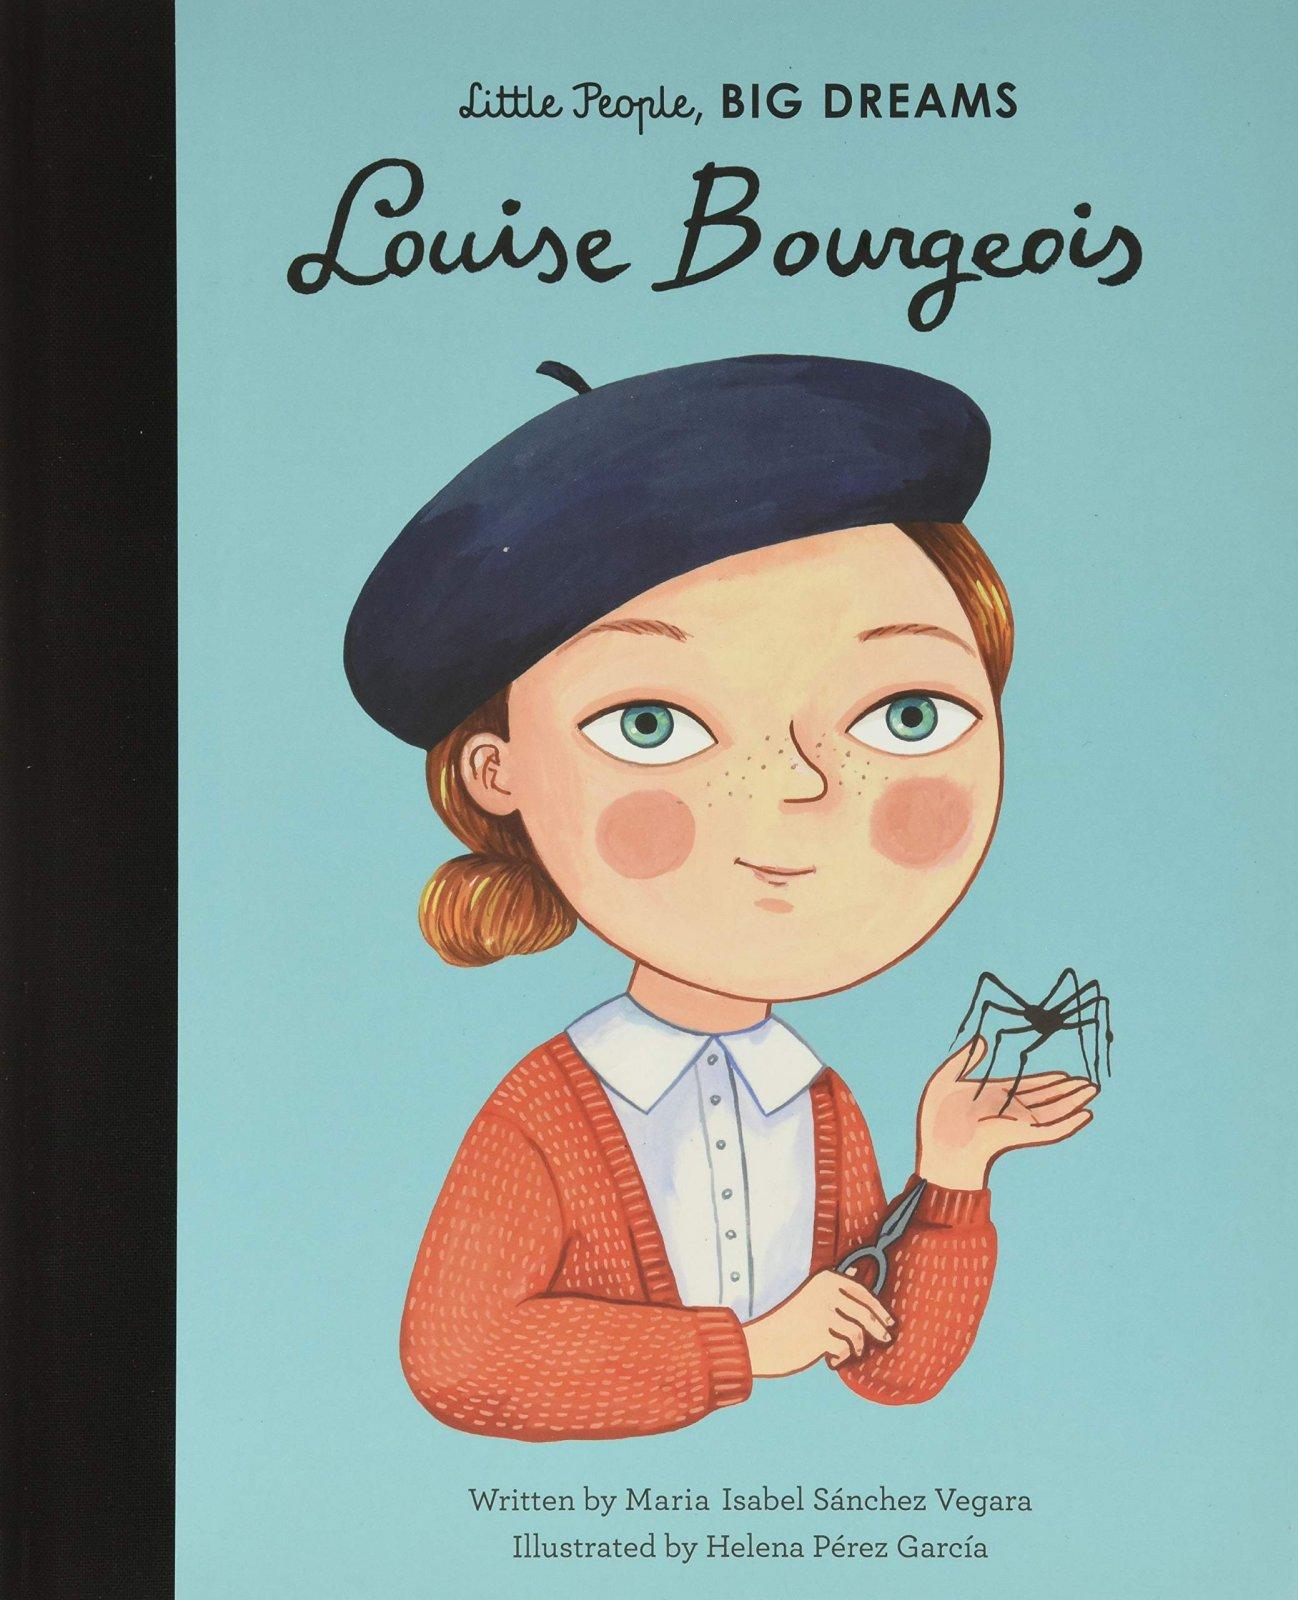 Little People, Big Dreams: Louise Bourgeois by Maria Isabel Sanchez Vegara